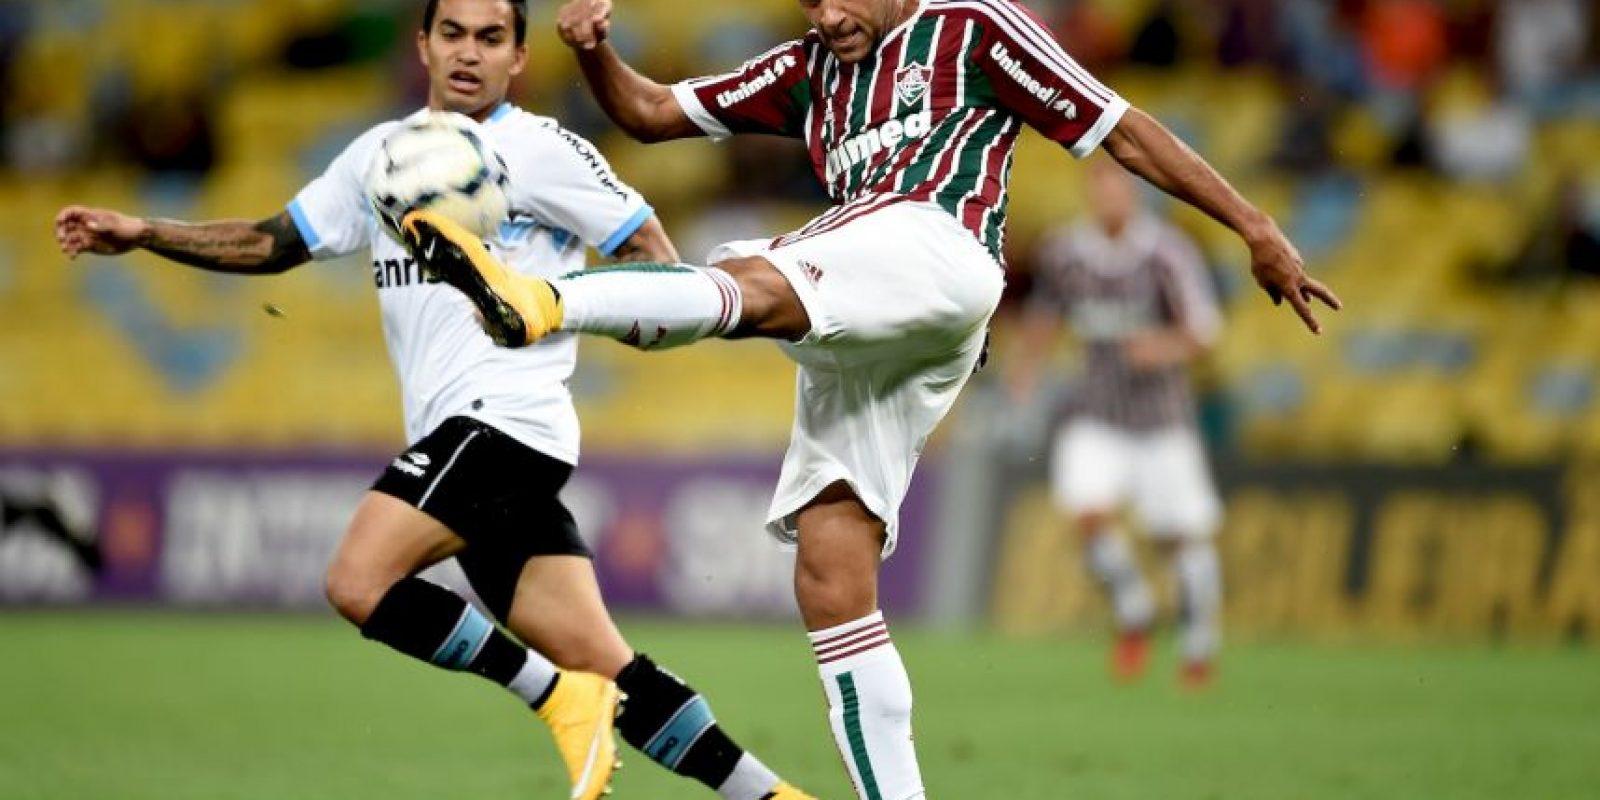 Esto ocurrió previo al duelo ante Fluminense por la Copa de Brasil. Foto:Getty Images